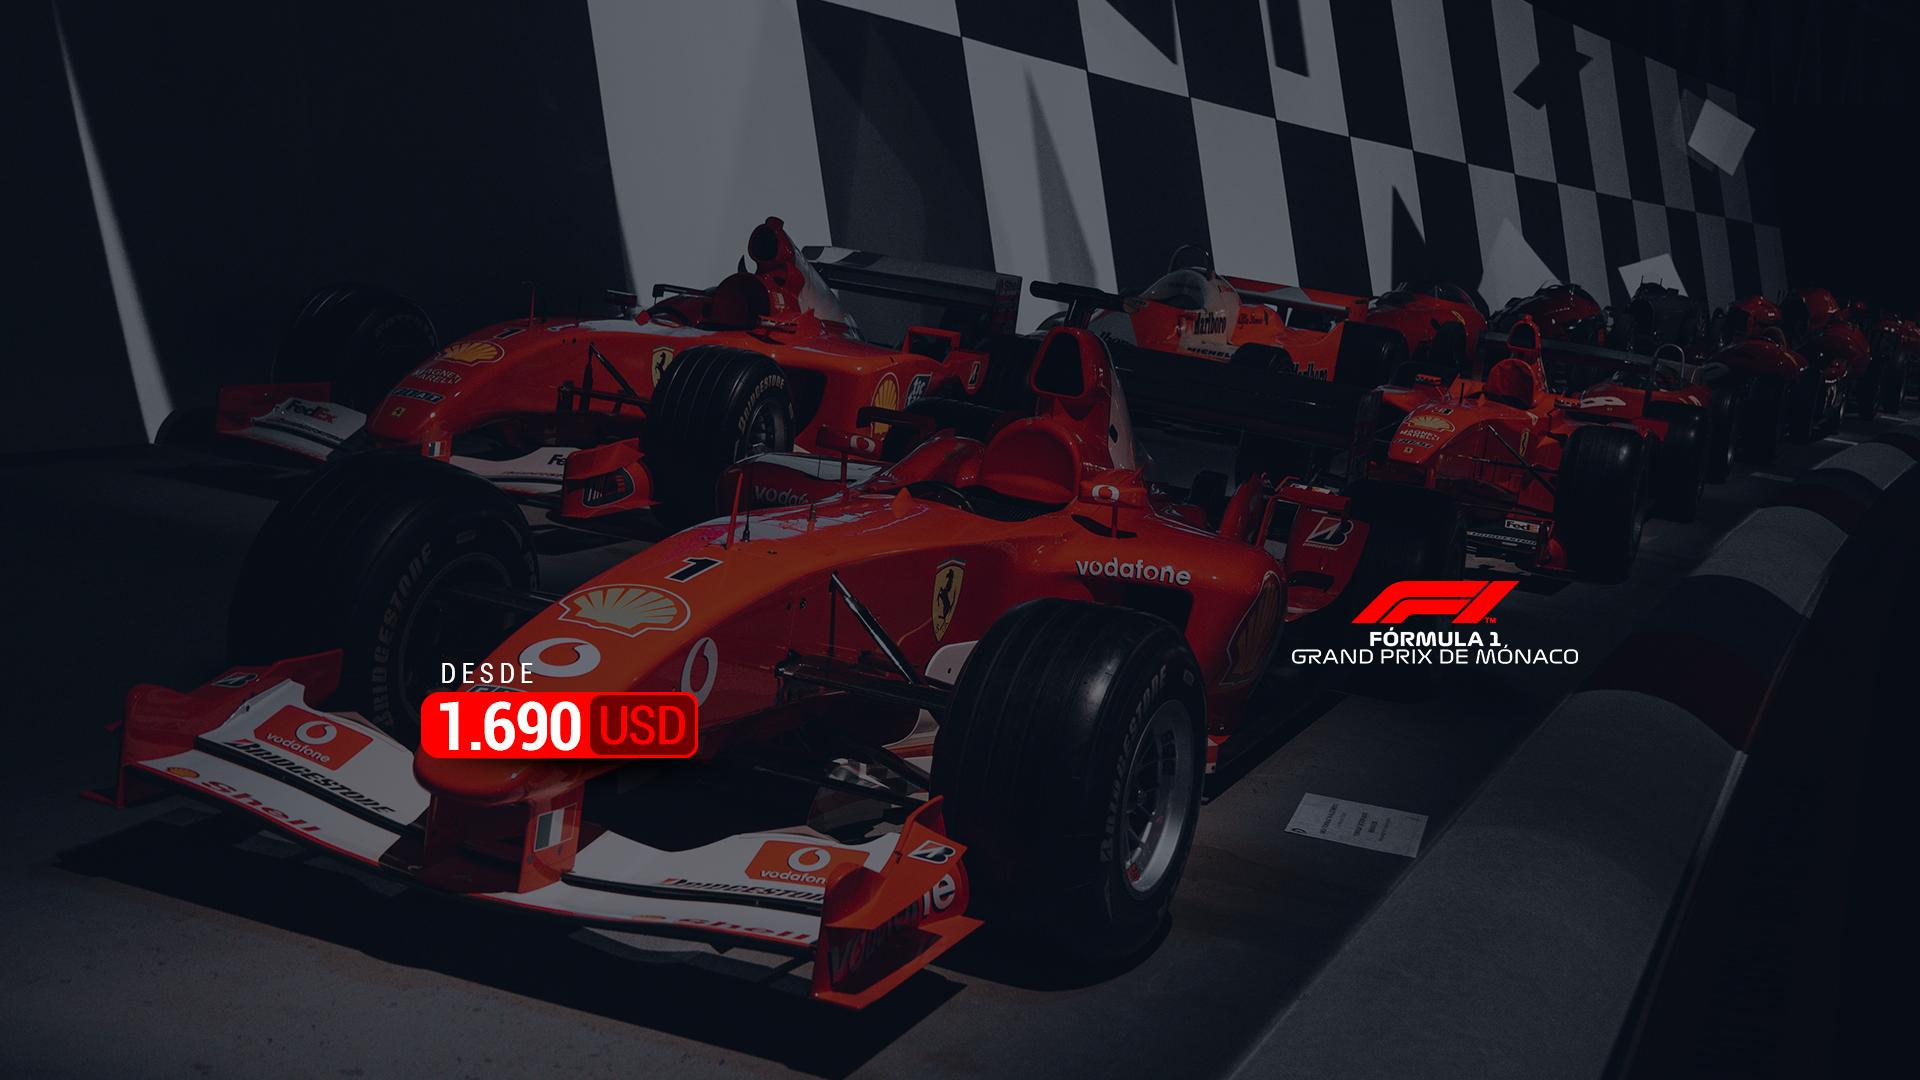 Fórmula 1 Grand Prix de Mónaco